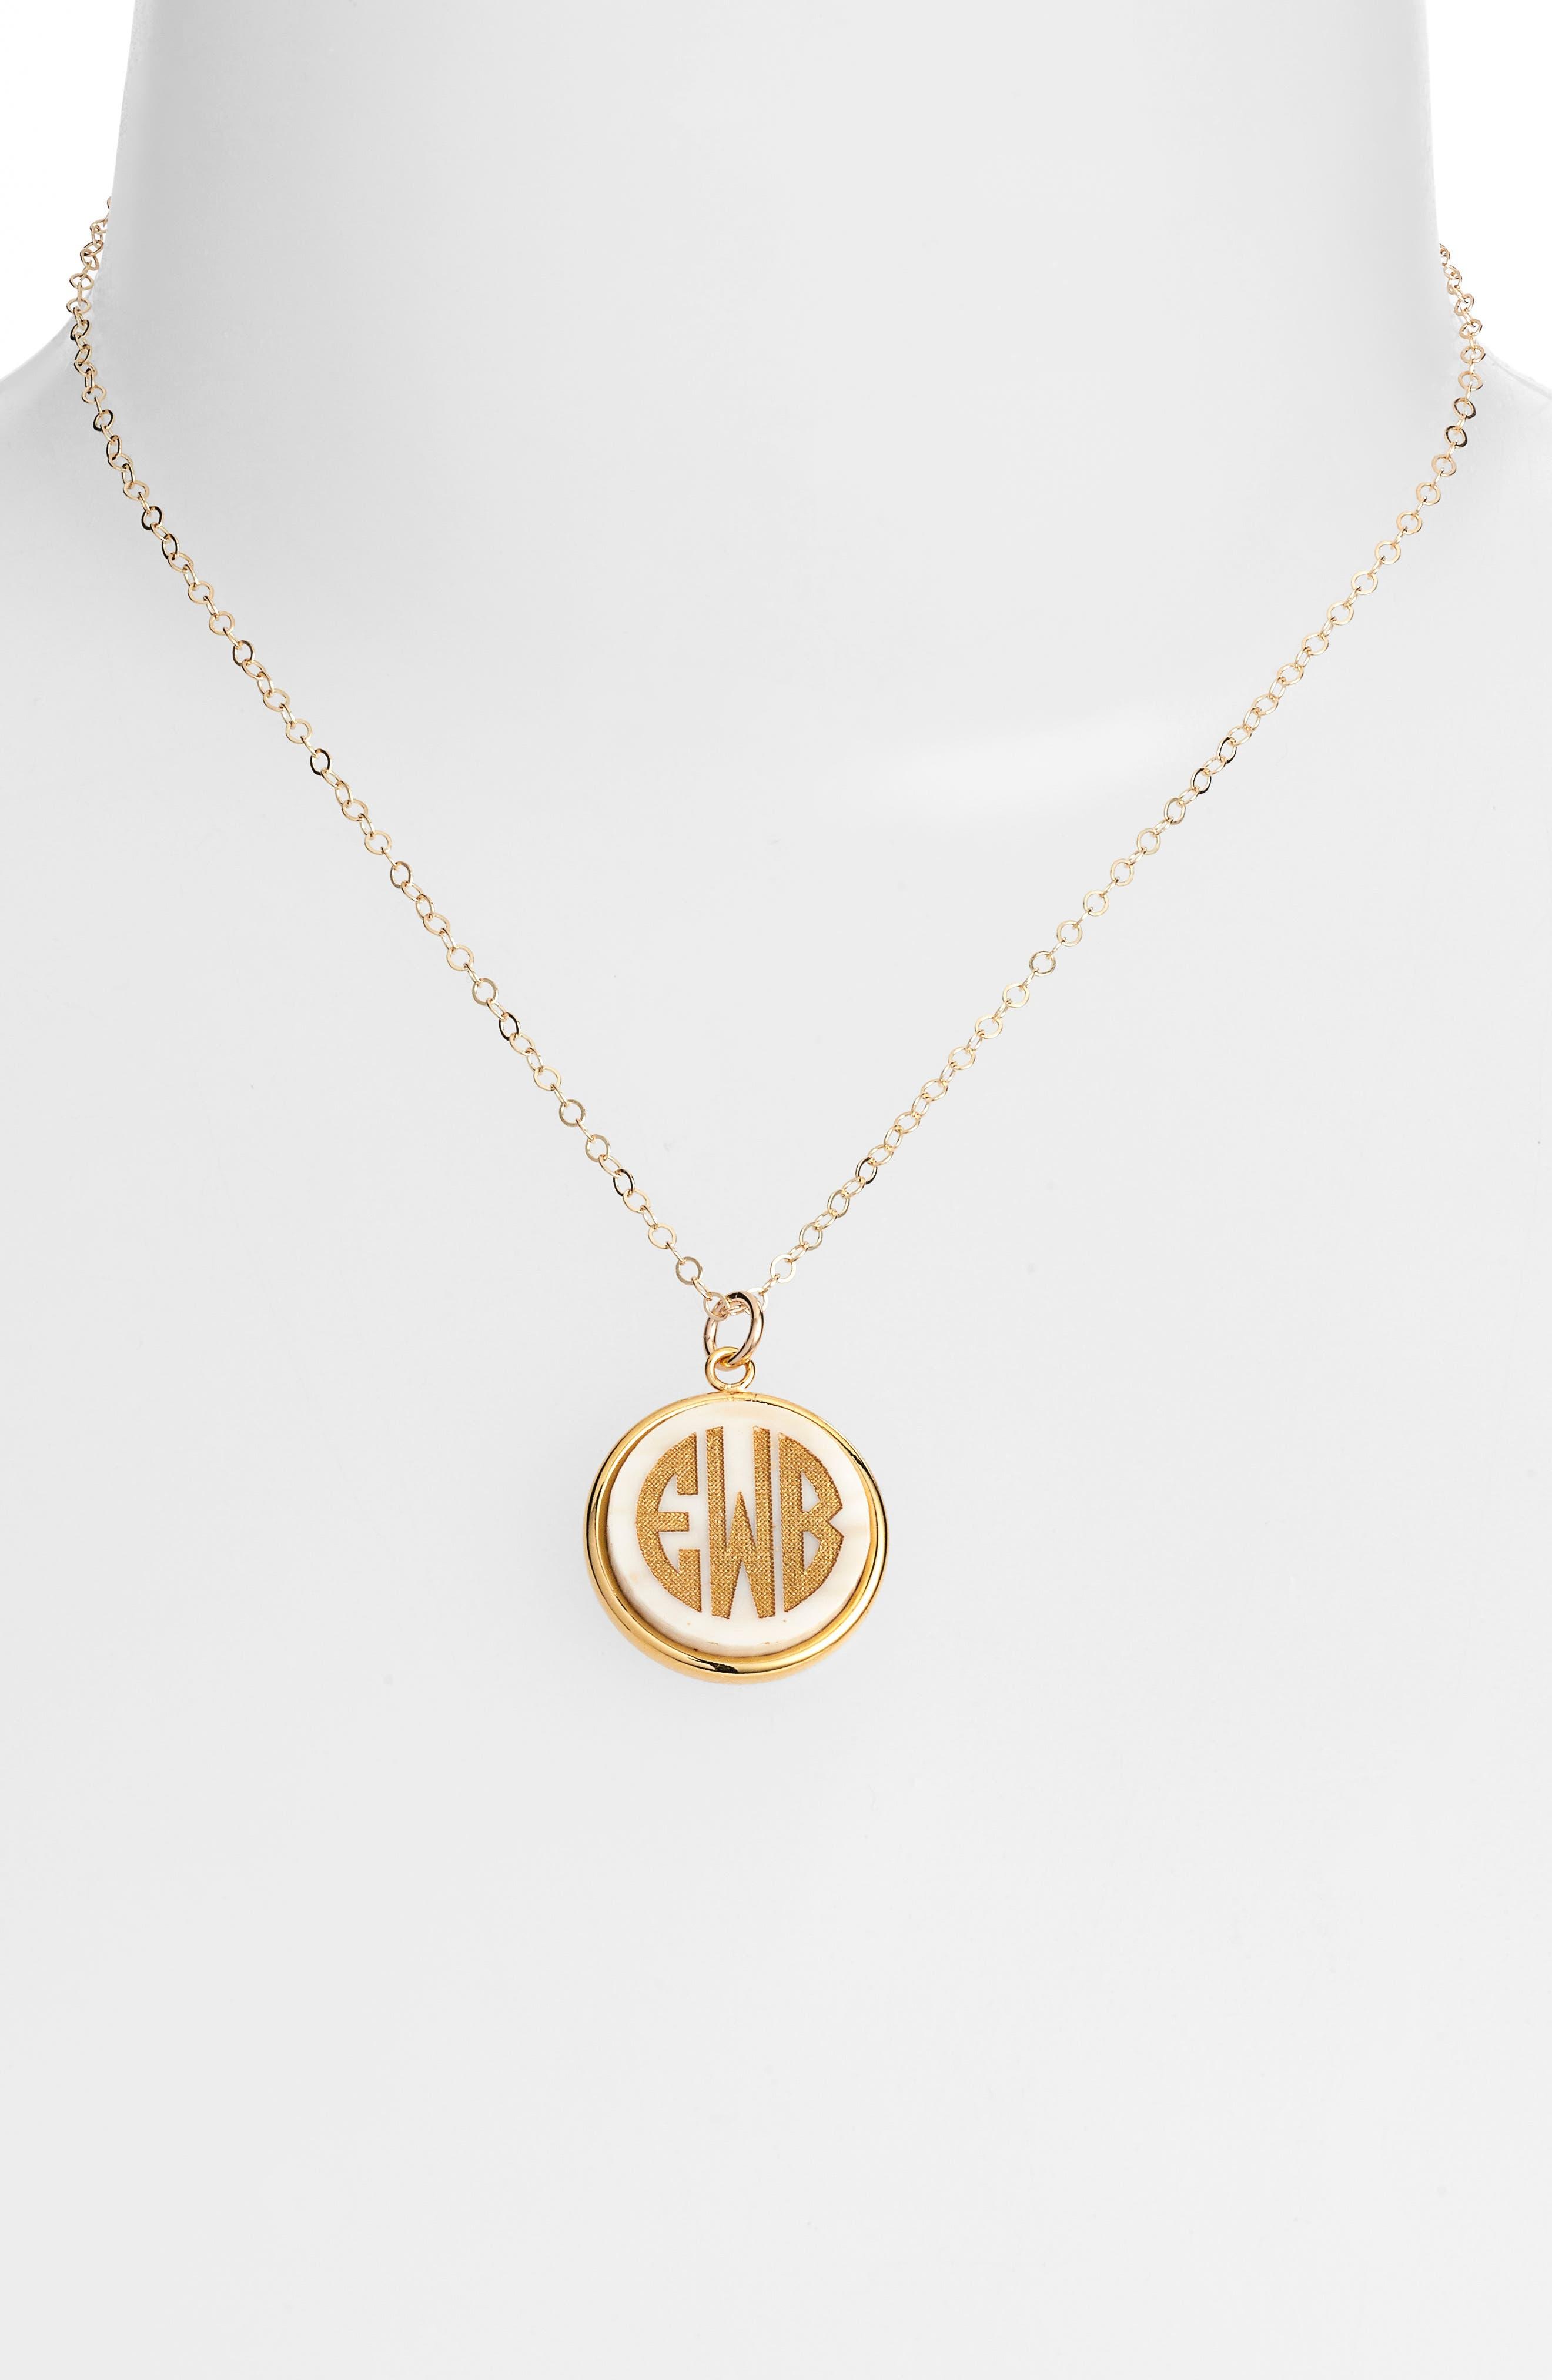 'Vineyard' Personalized Monogram Pendant Necklace,                             Alternate thumbnail 15, color,